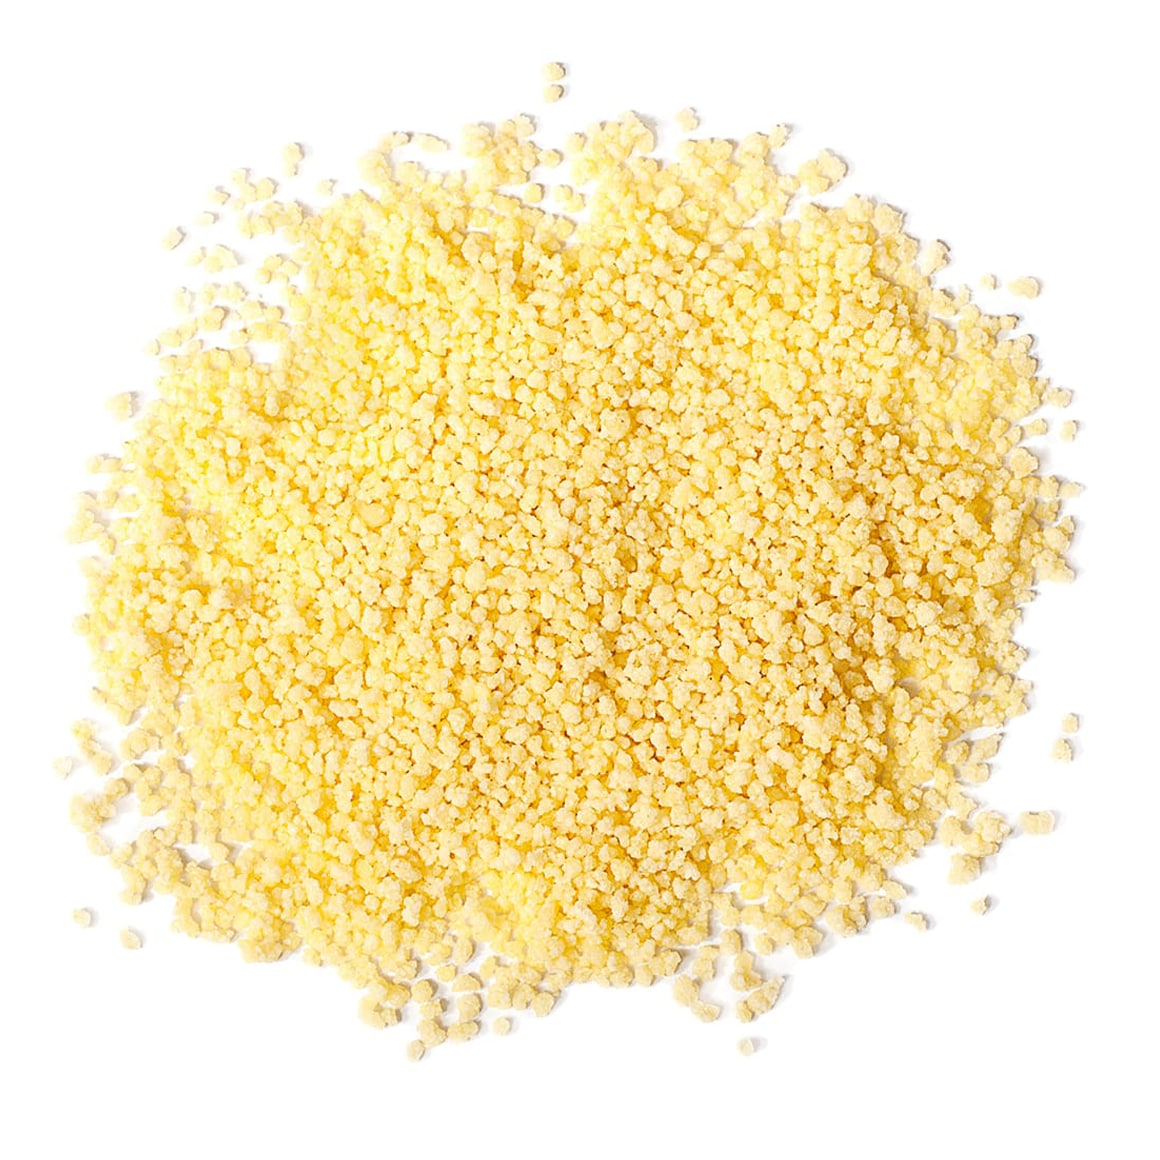 Organic Whole Wheat Couscous